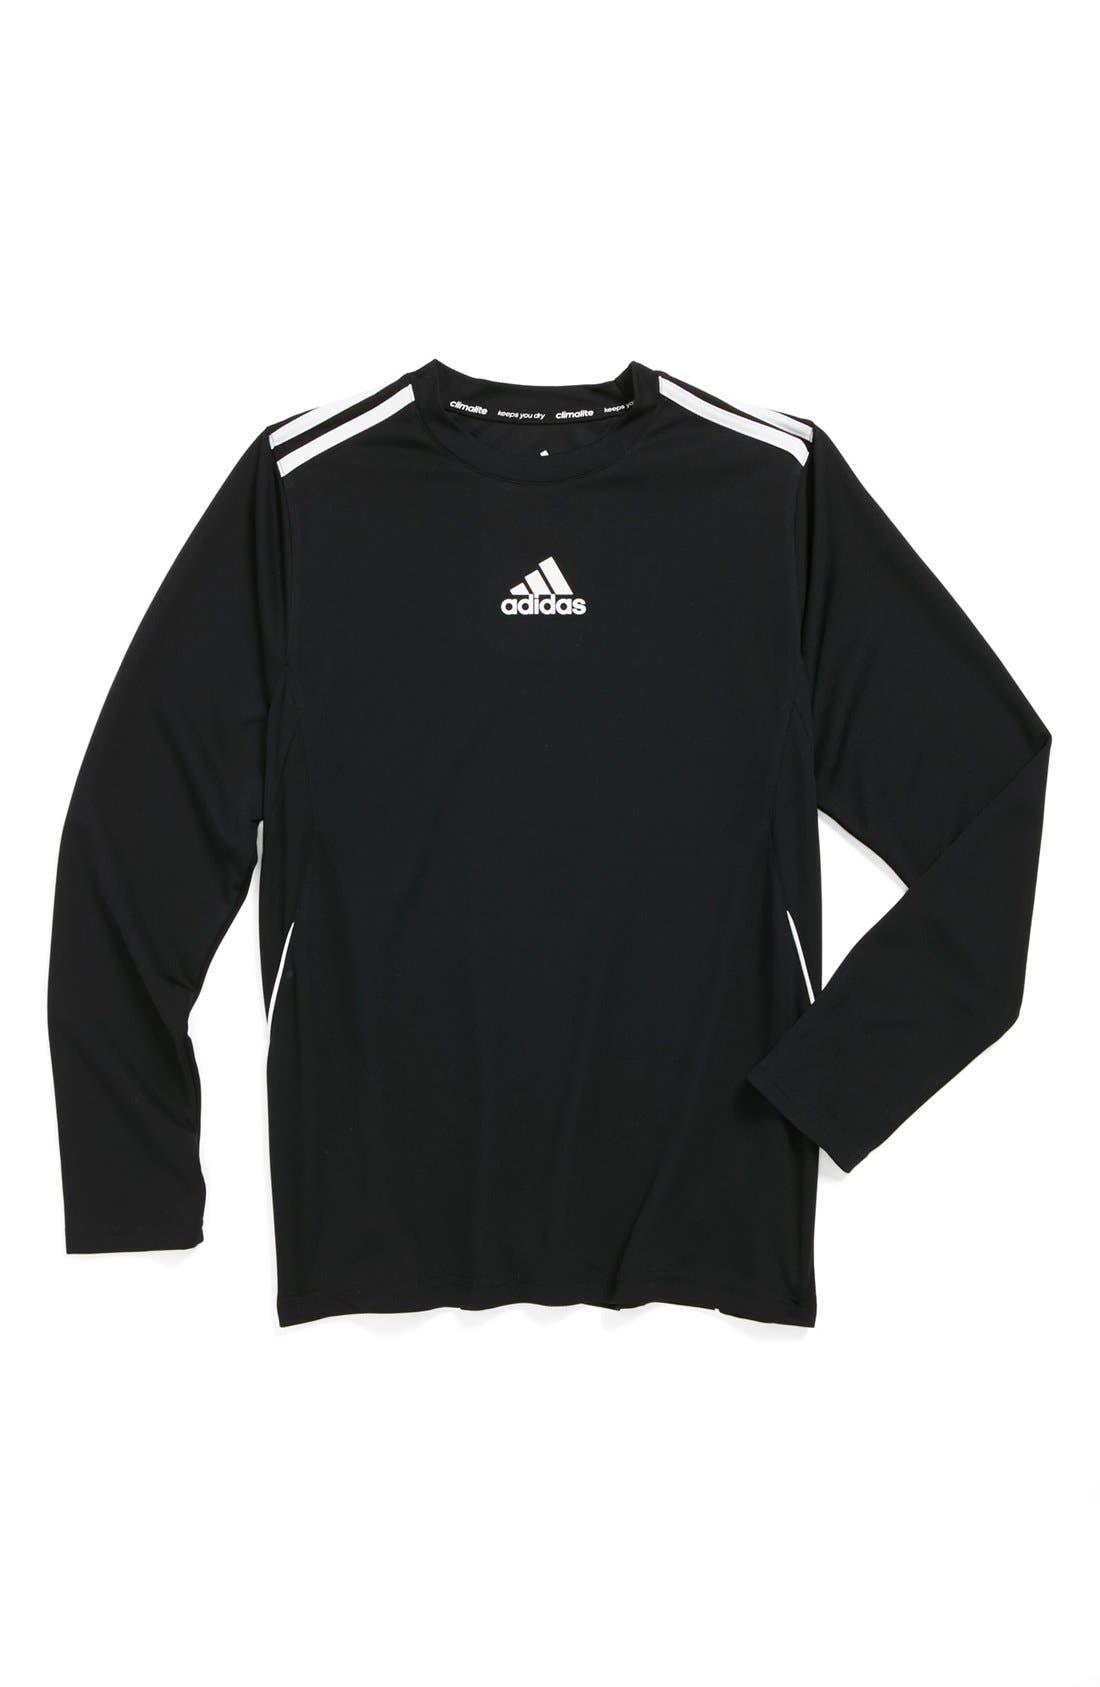 ClimaCore Long Sleeve Shirt,                             Main thumbnail 1, color,                             001